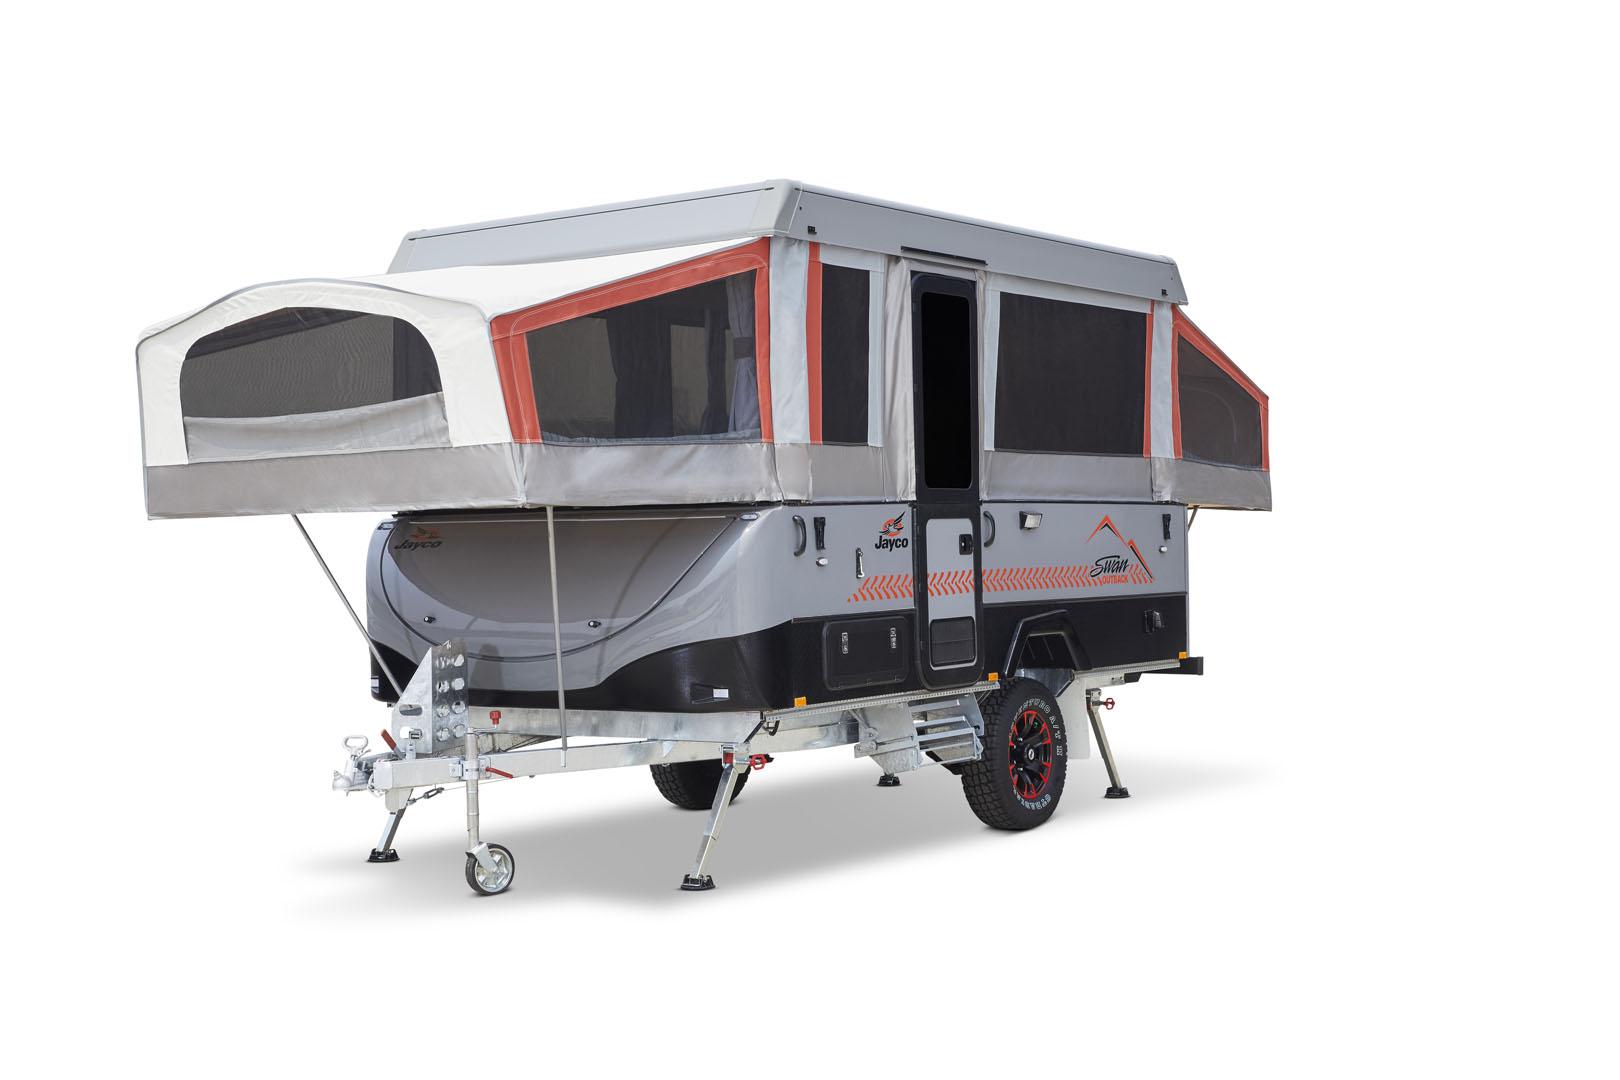 IMG 2730 - 2020 Jayco Camper Trailers